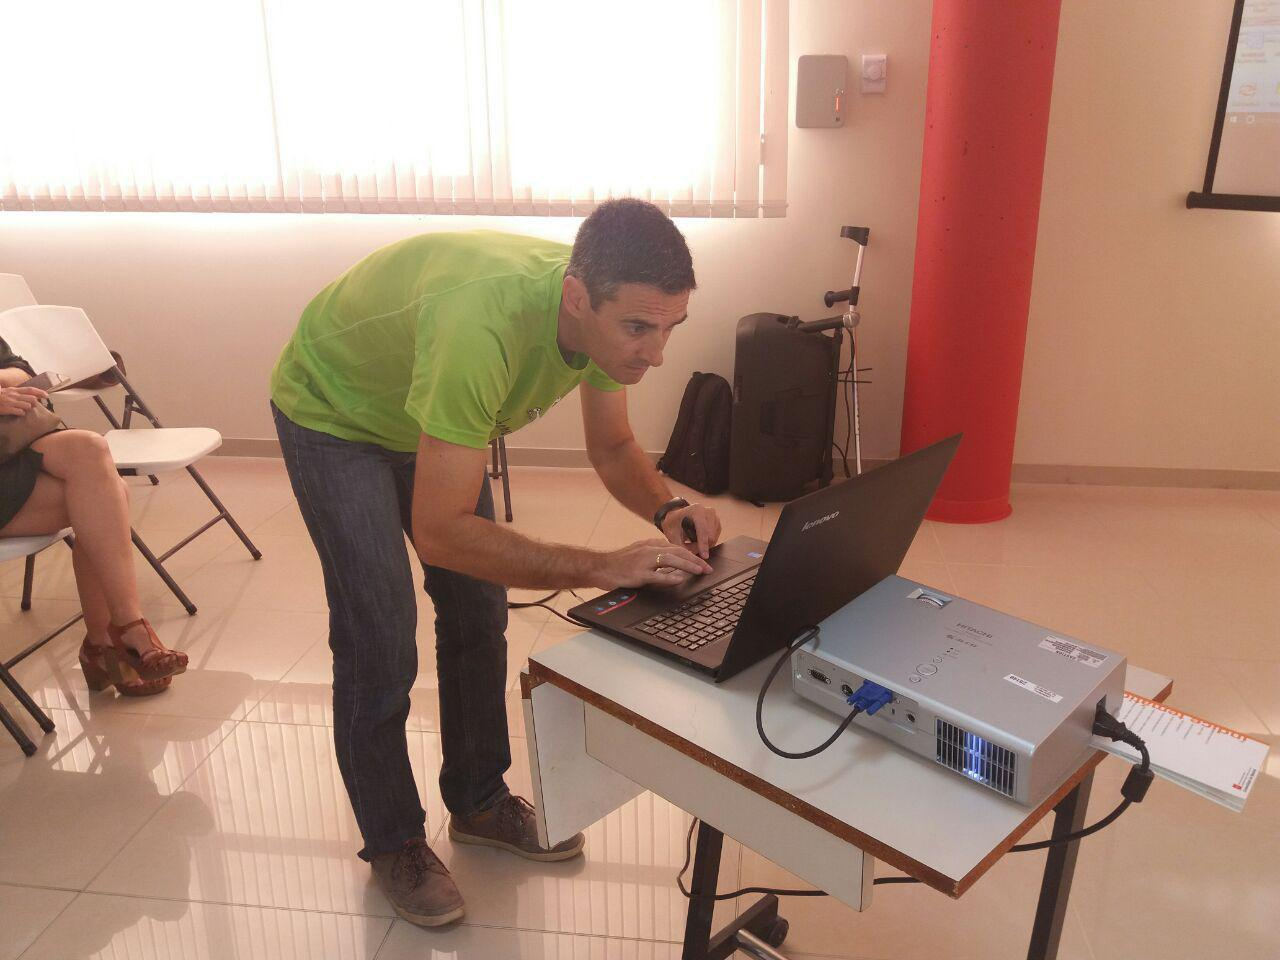 con ordenador